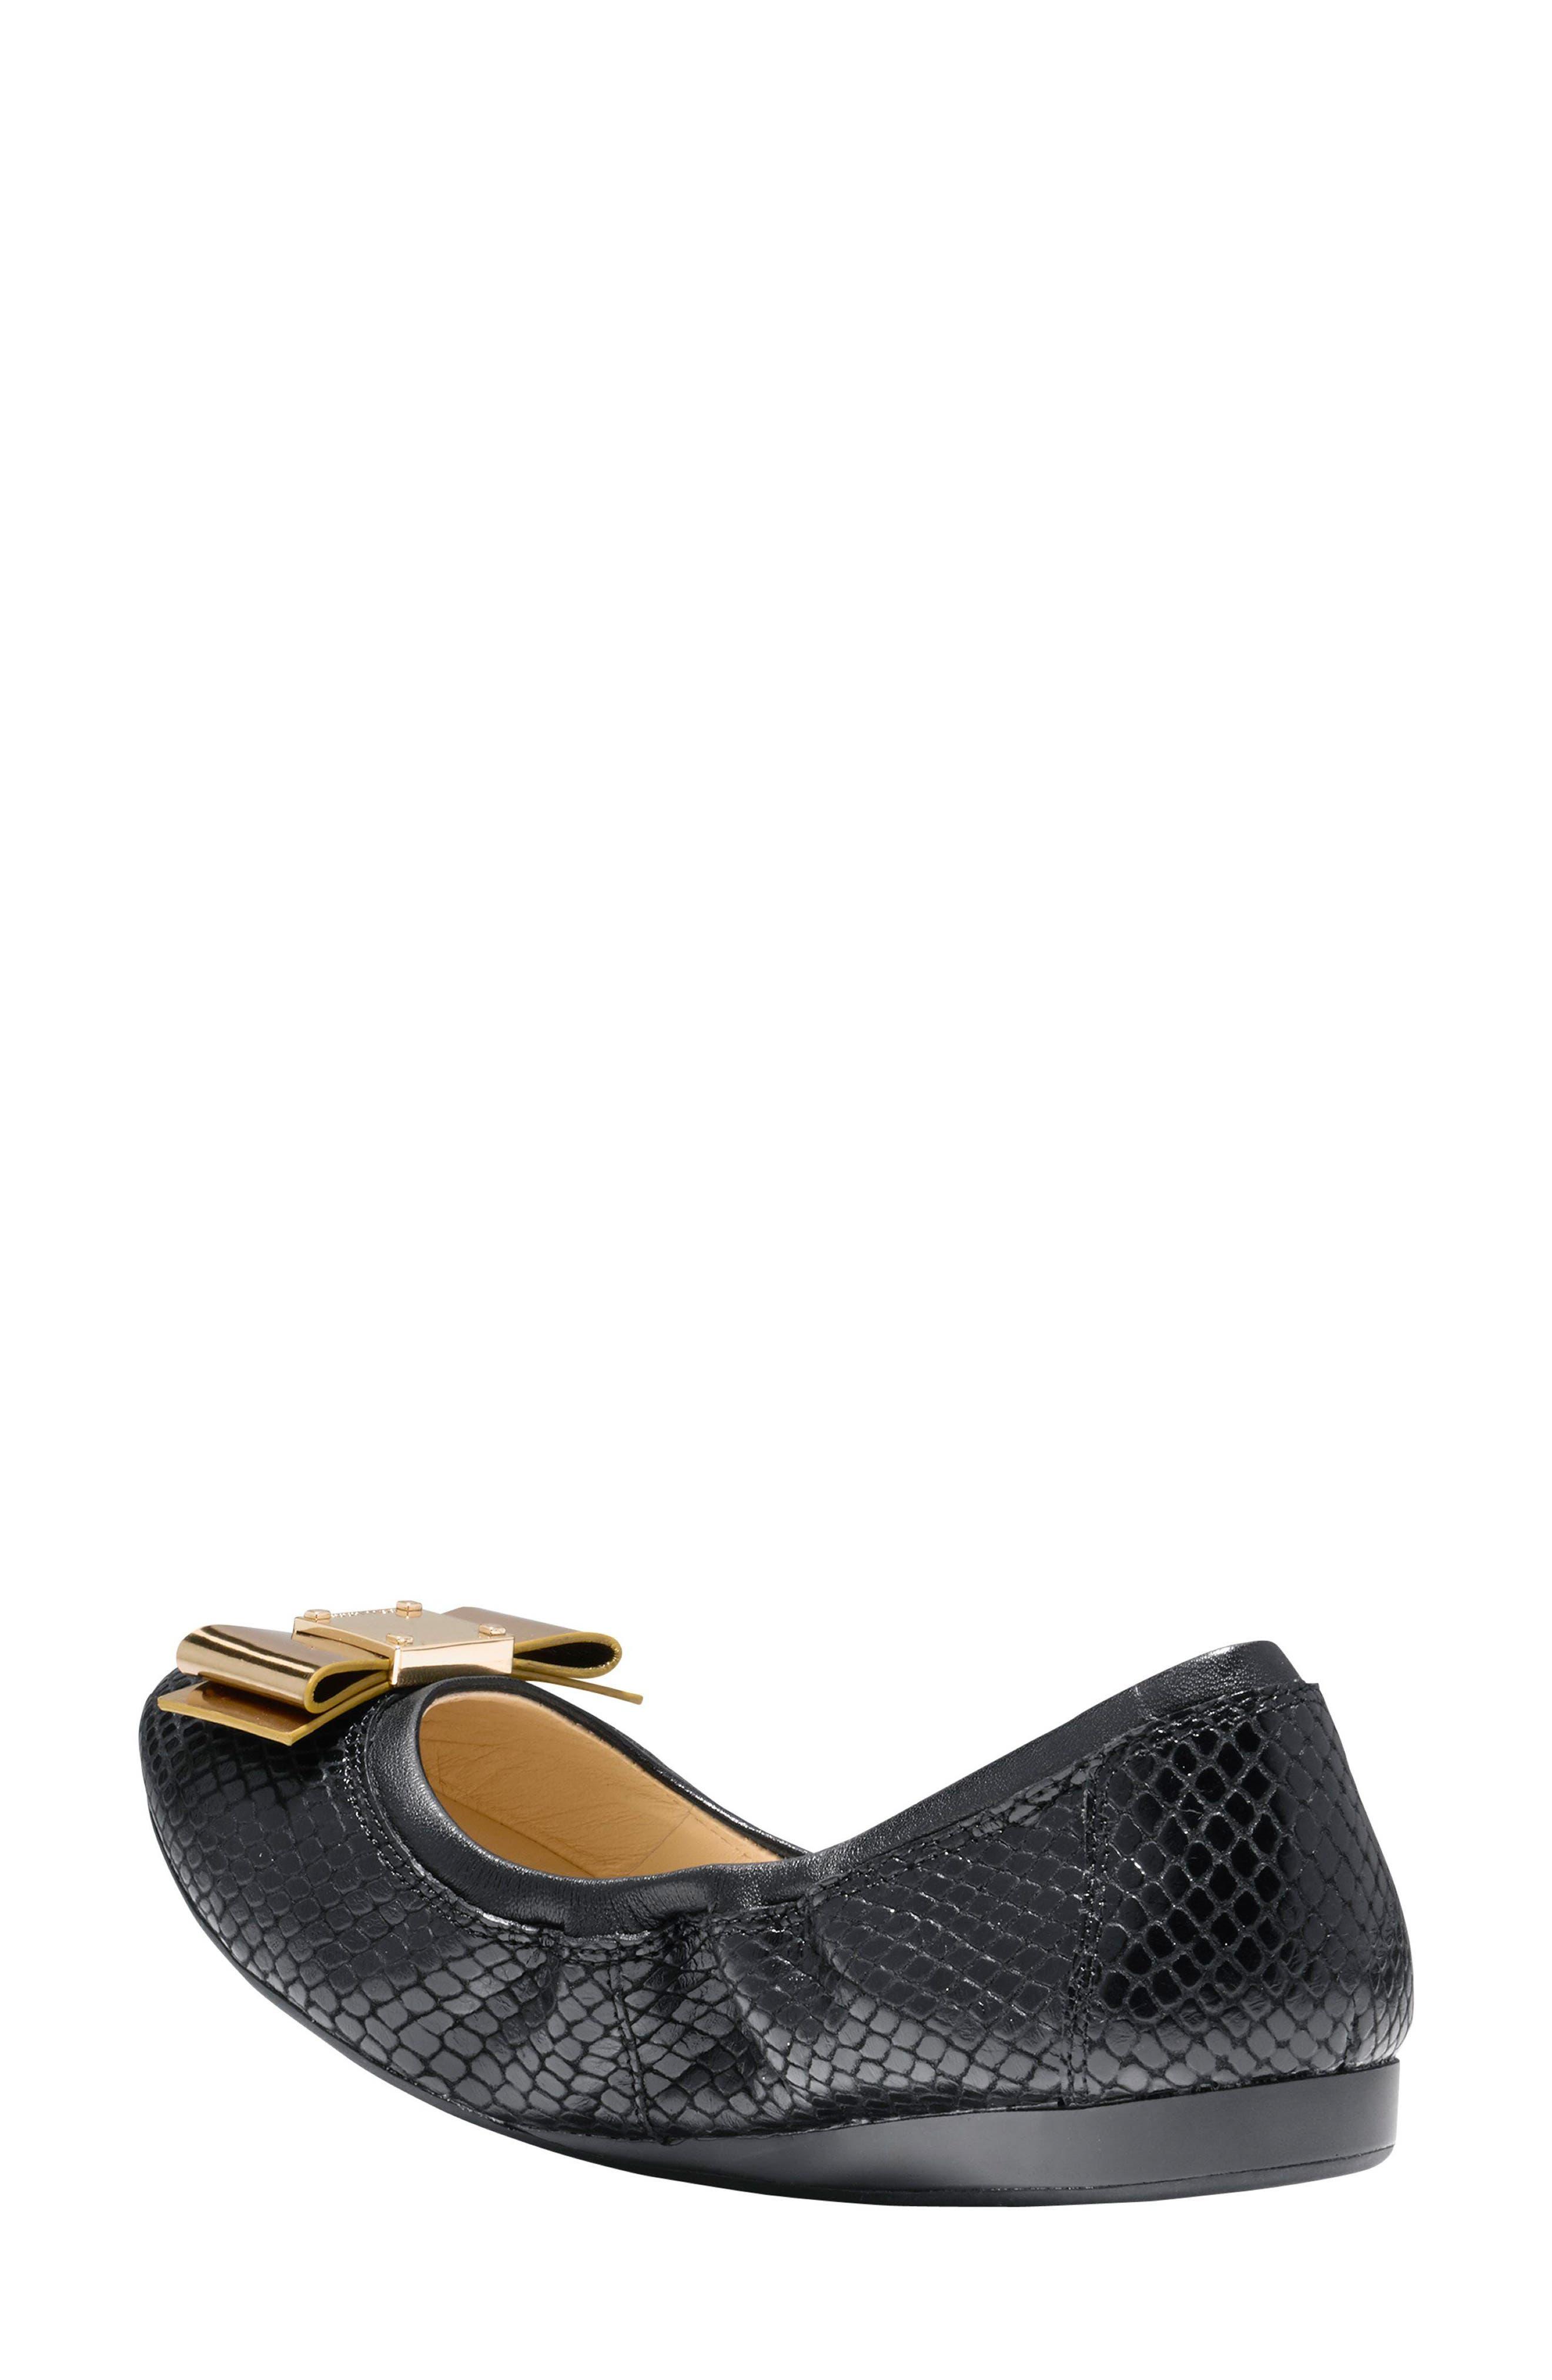 'Tali' Bow Ballet Flat,                             Alternate thumbnail 2, color,                             Black Snake Print Leather